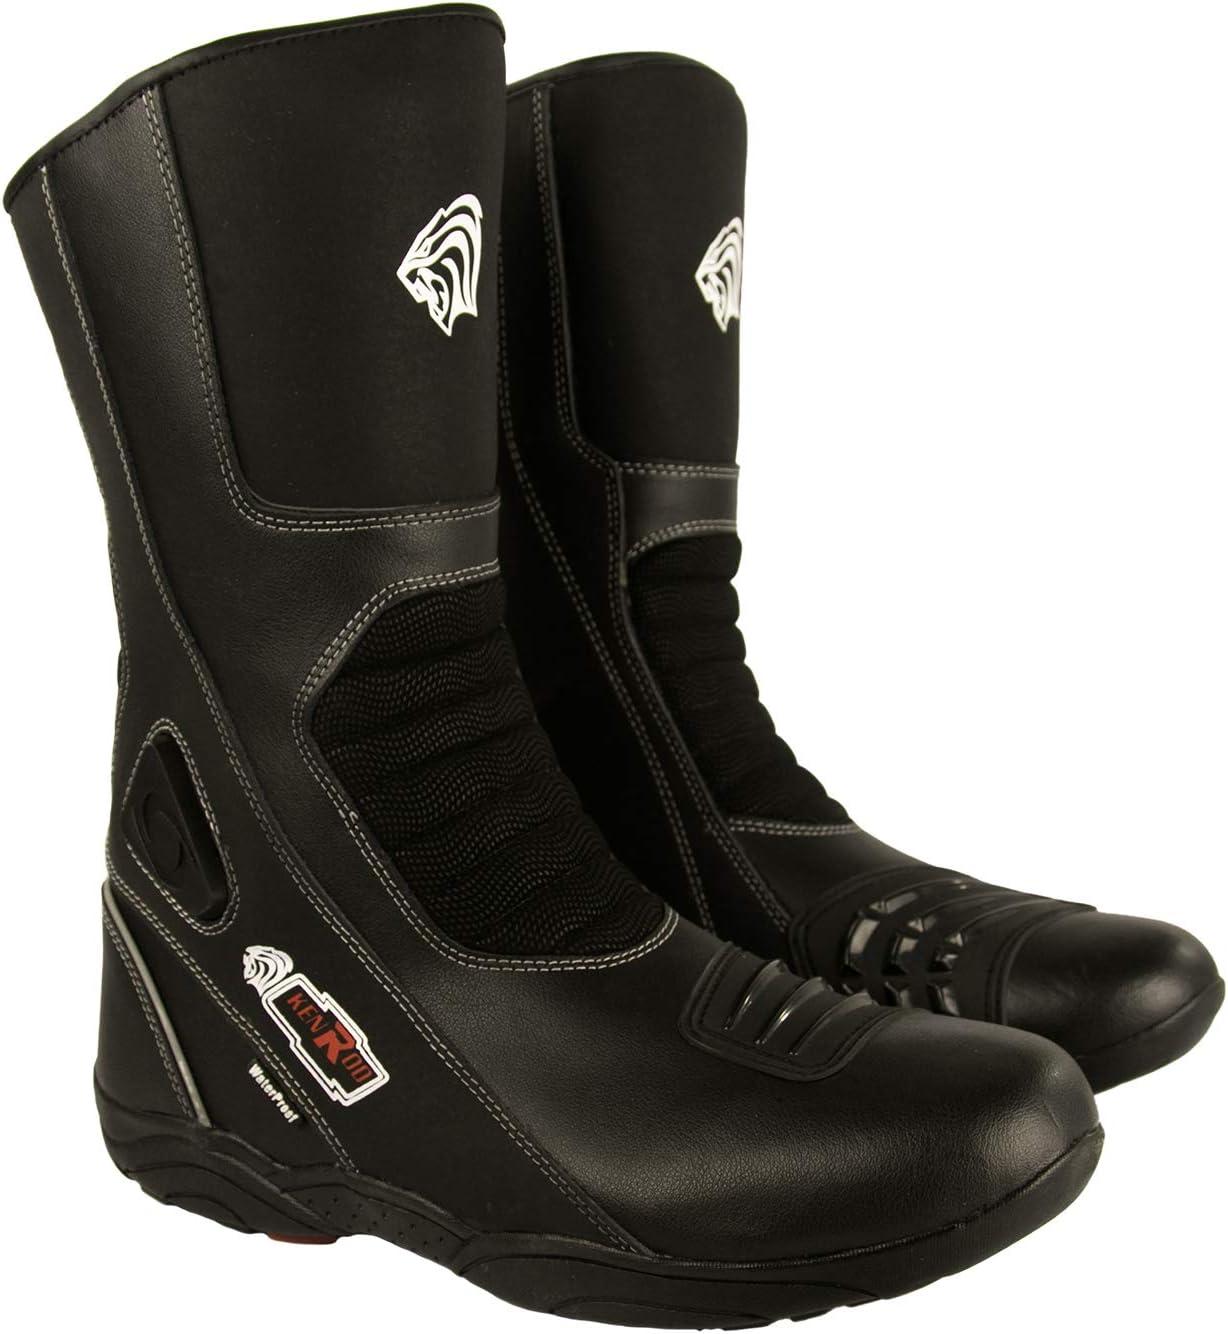 Zerimar Botas Piel Moto   Botas Moto   Botas Motocicleta de Cuero   Botas de Moto Proteccion (Carbon-Negro, 43)